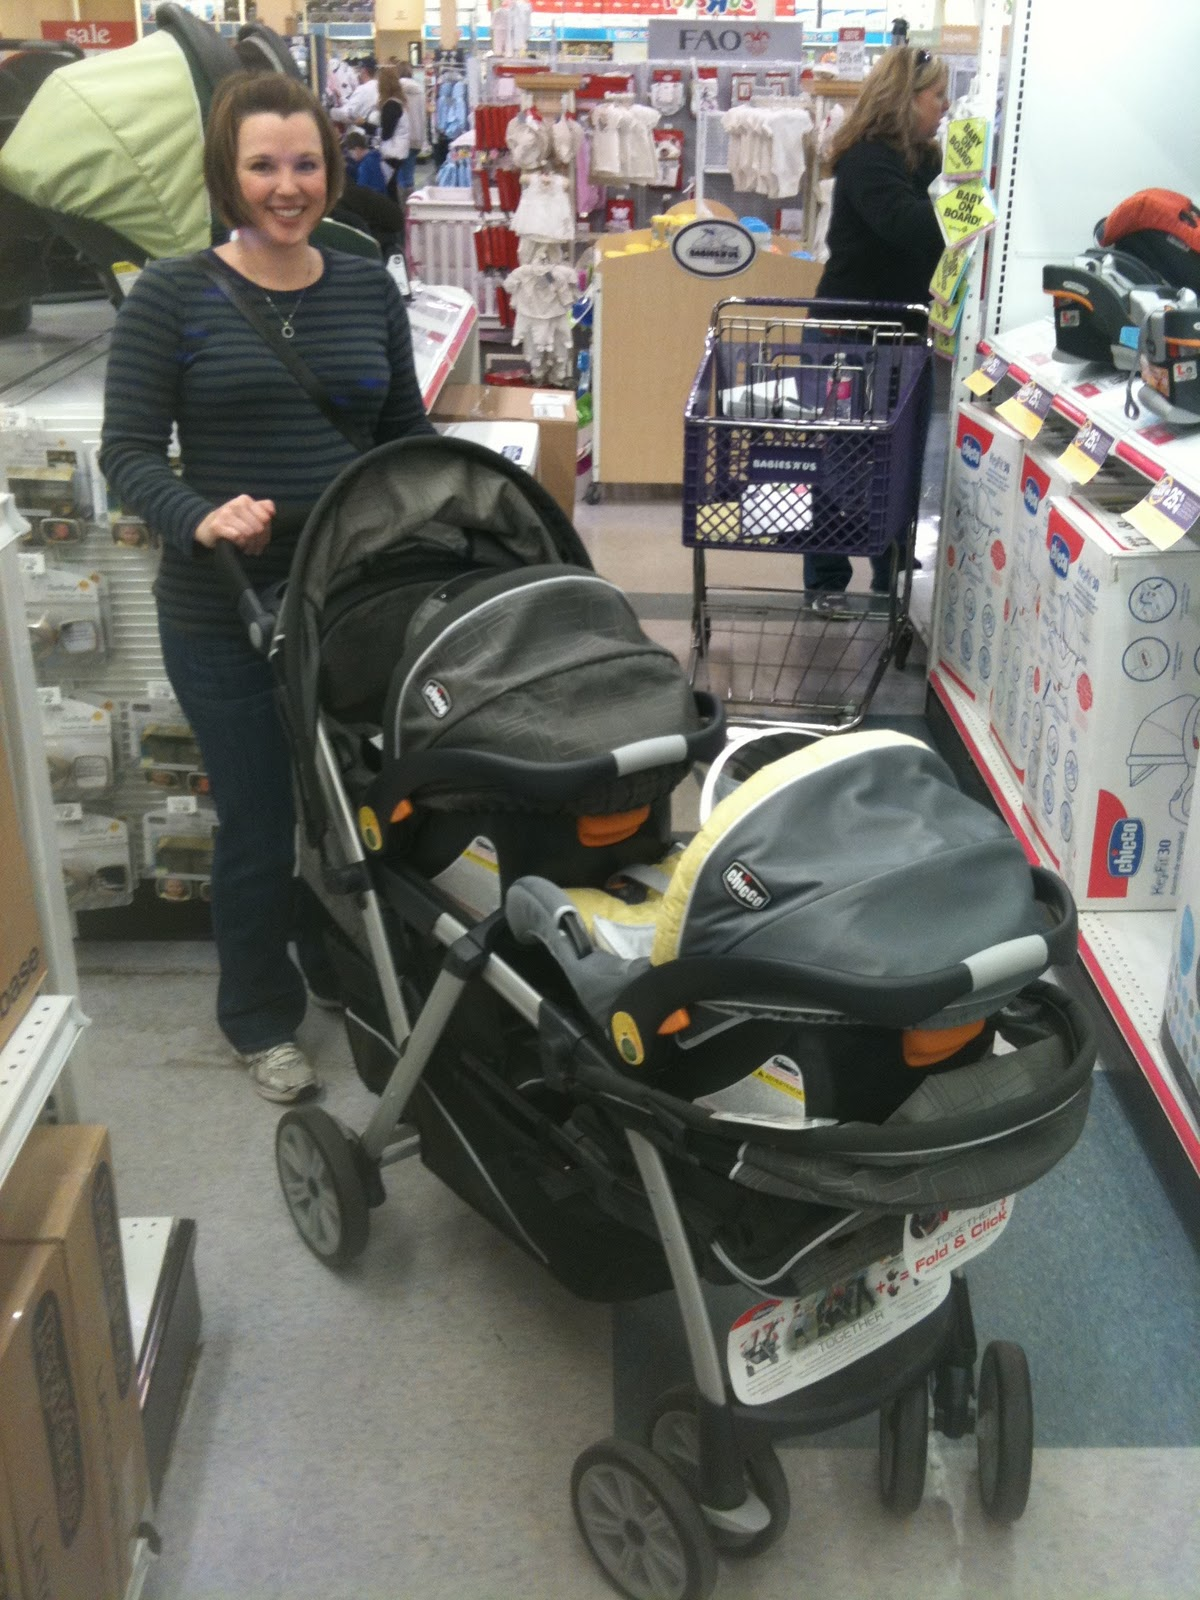 http://2.bp.blogspot.com/_MS4SfcHgjMY/TUf0OLLcfLI/AAAAAAAAACs/OEXXCYBM_PE/s1600/double+stroller.JPG